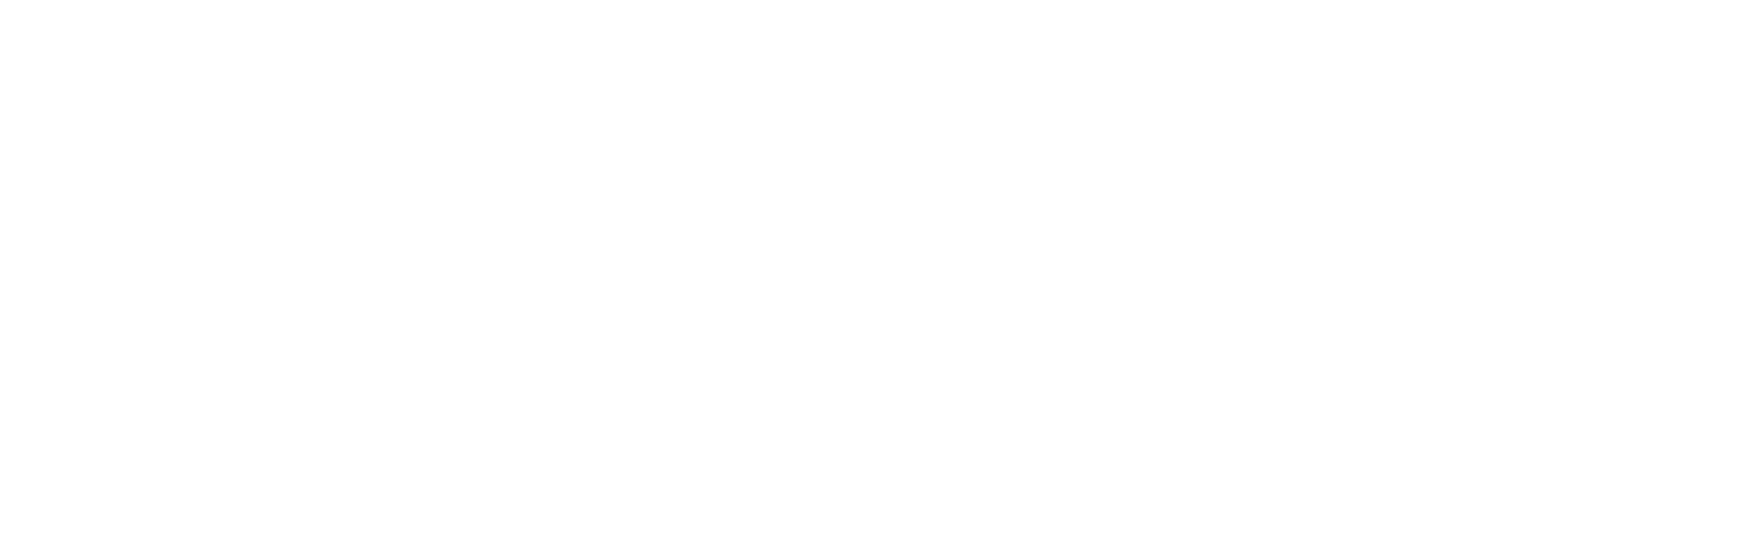 Hofincons International Pvt. Ltd. - Erp company logo